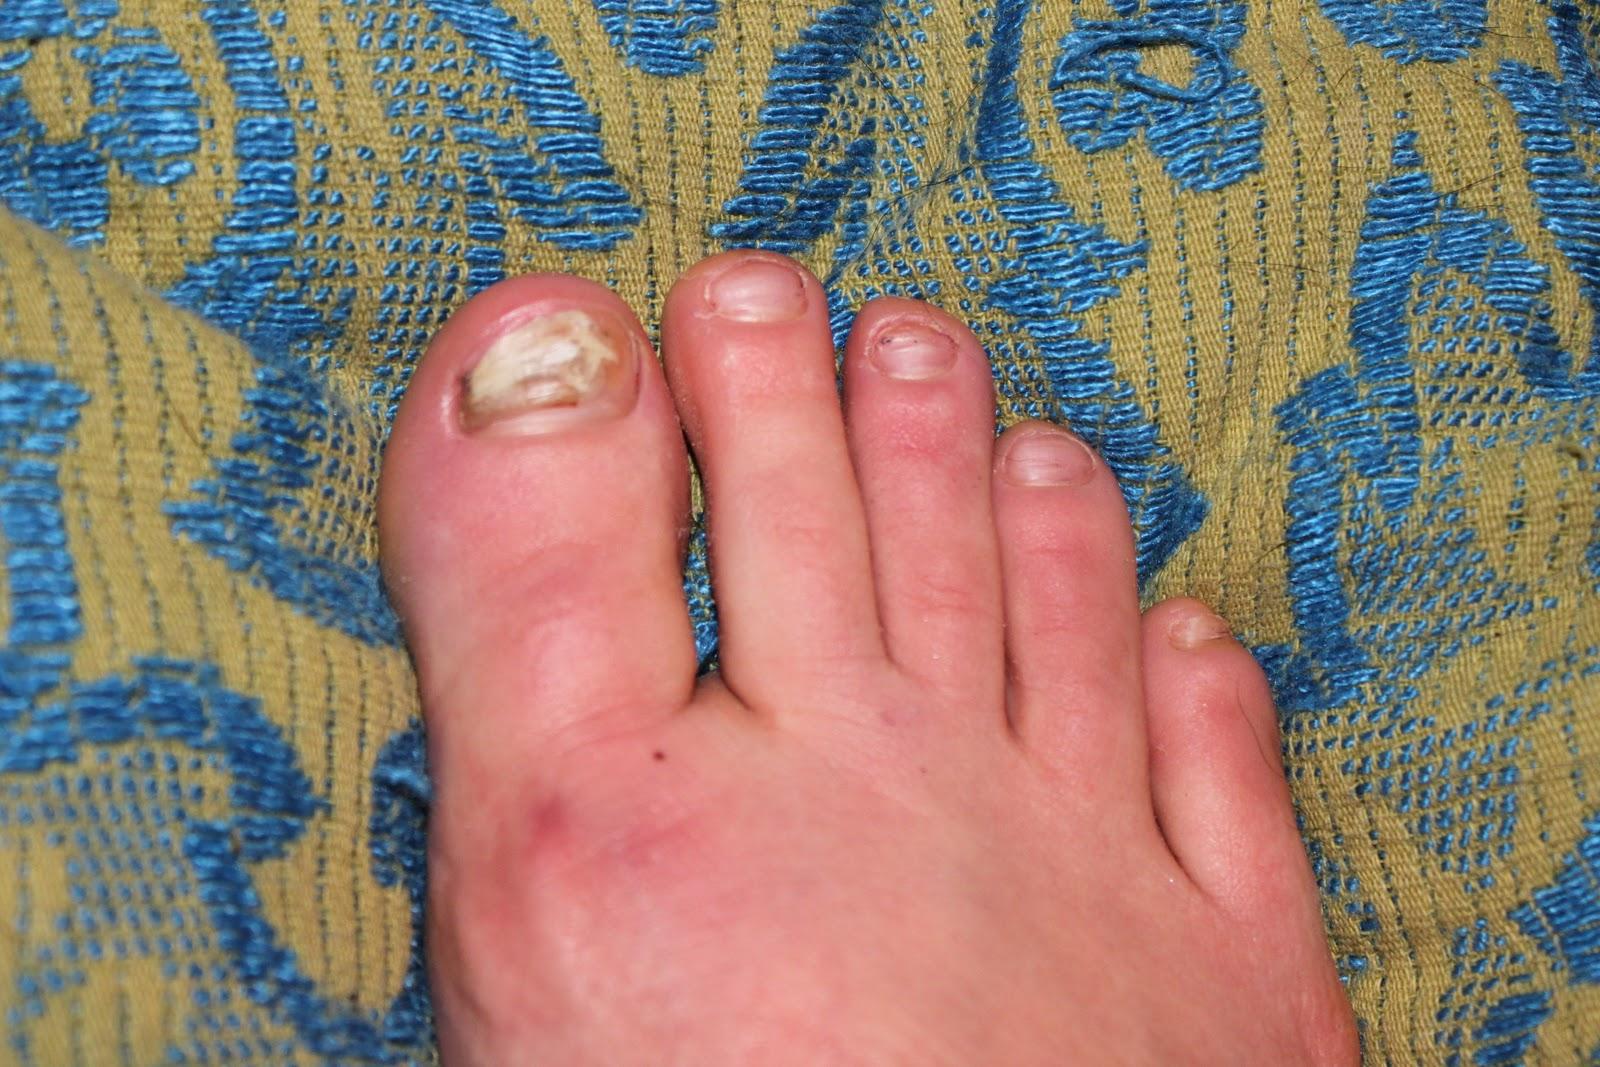 Wild Defined: Yes, I\'m losing toenails